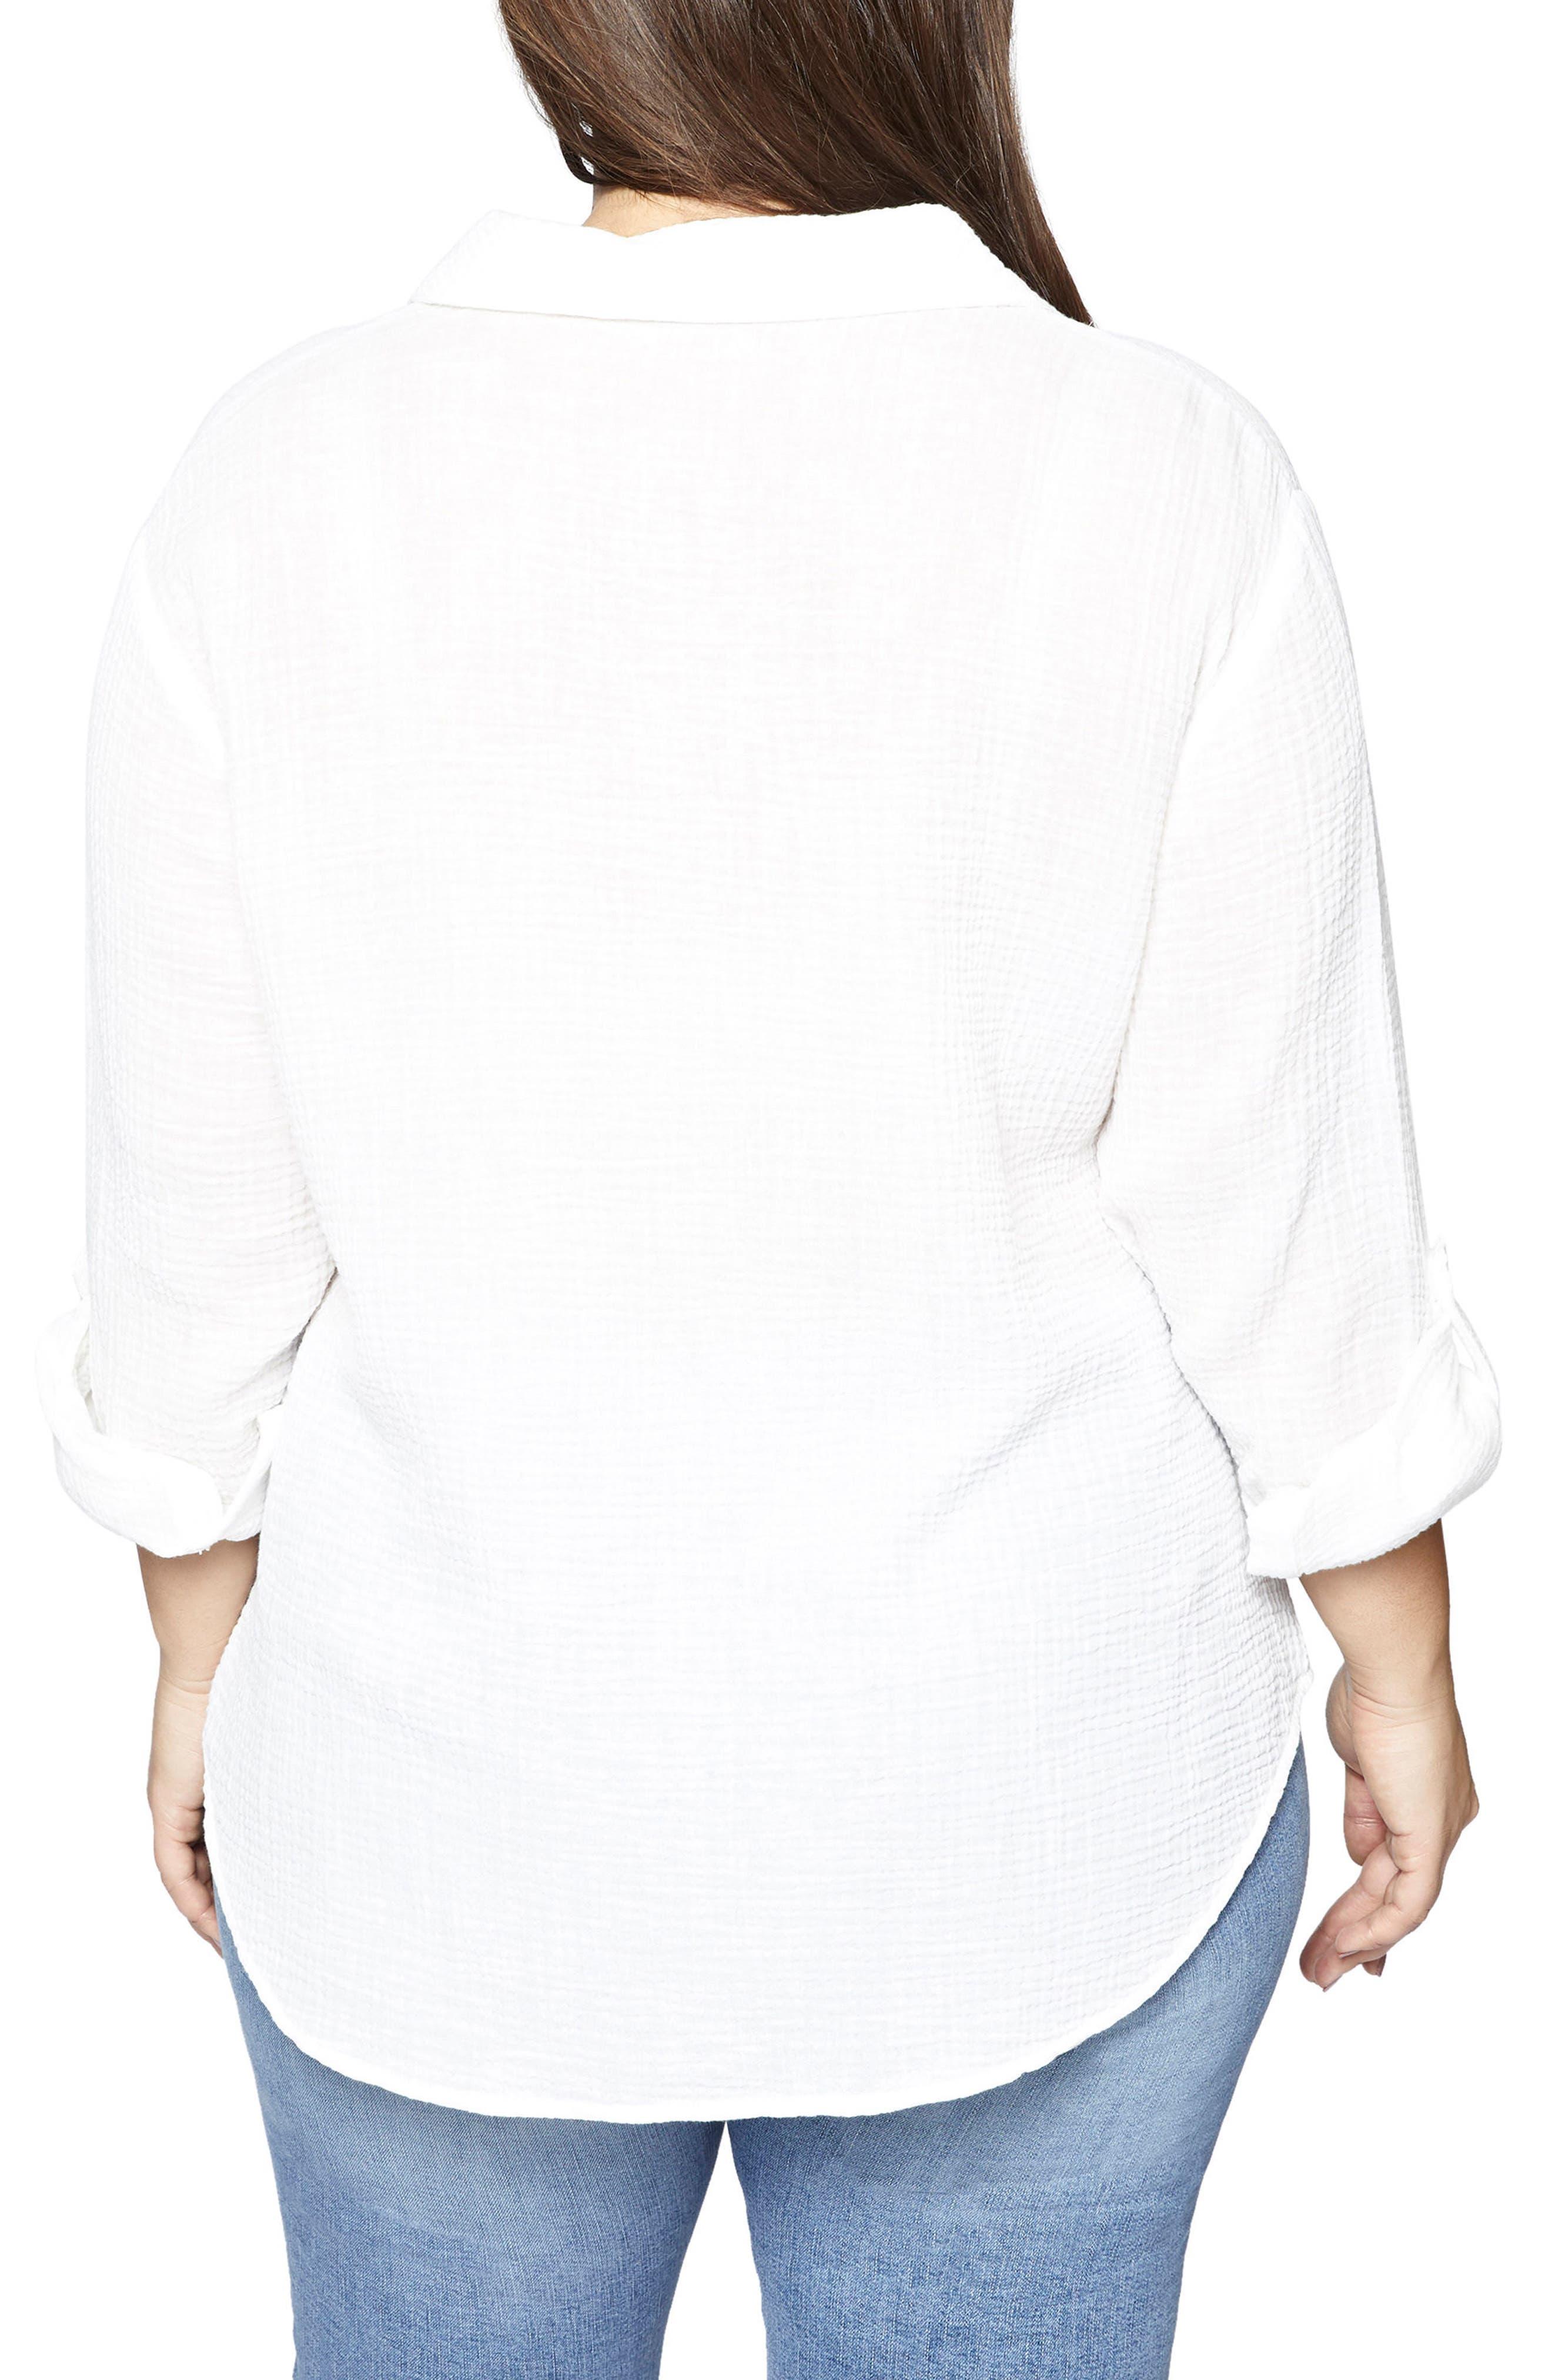 SANCTUARY, Steady Boyfriend Shirt, Alternate thumbnail 2, color, WHITE